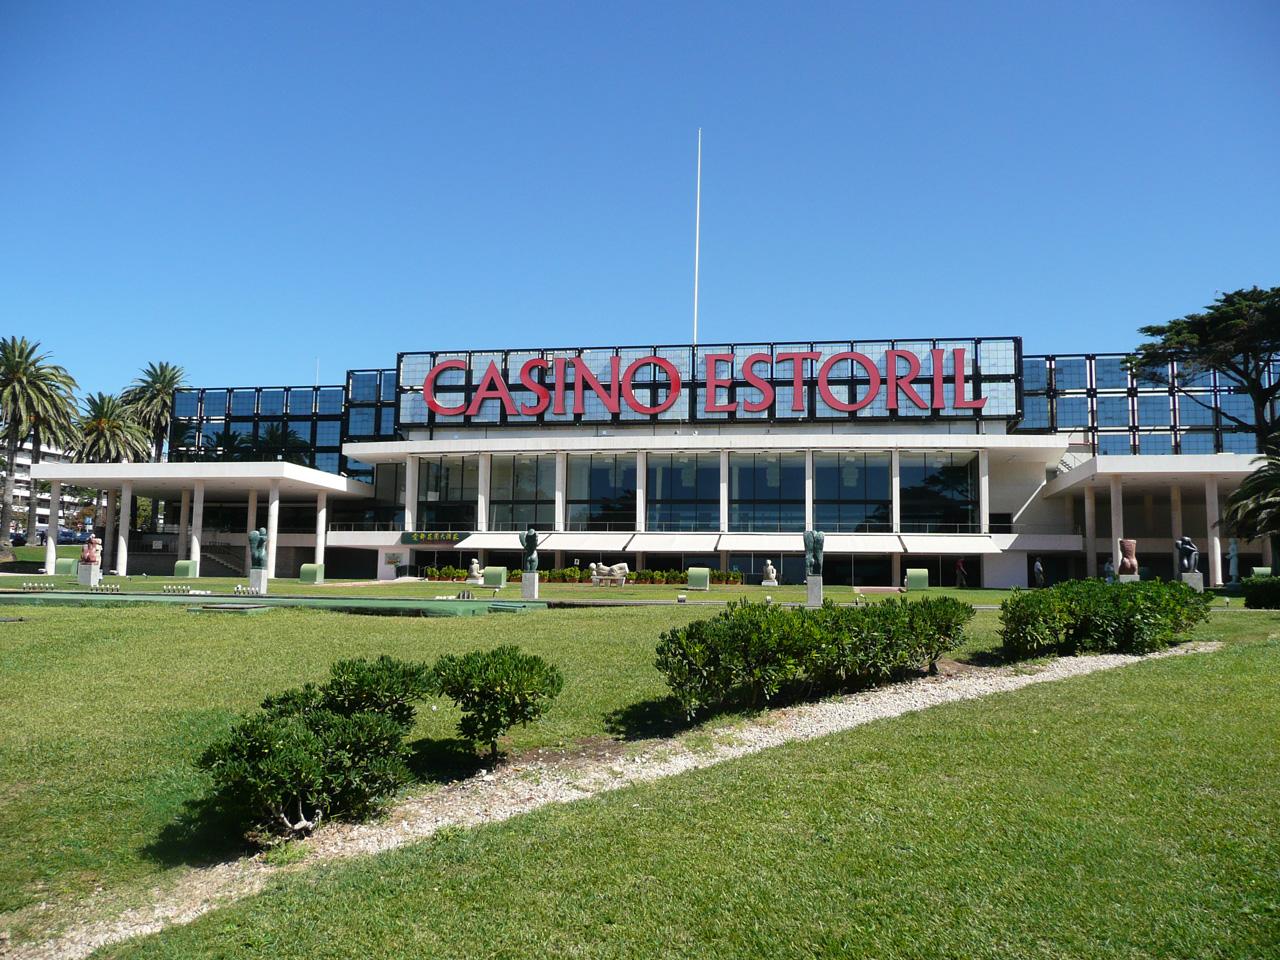 Casino de Estoril. Photo: Aquiler de Coches